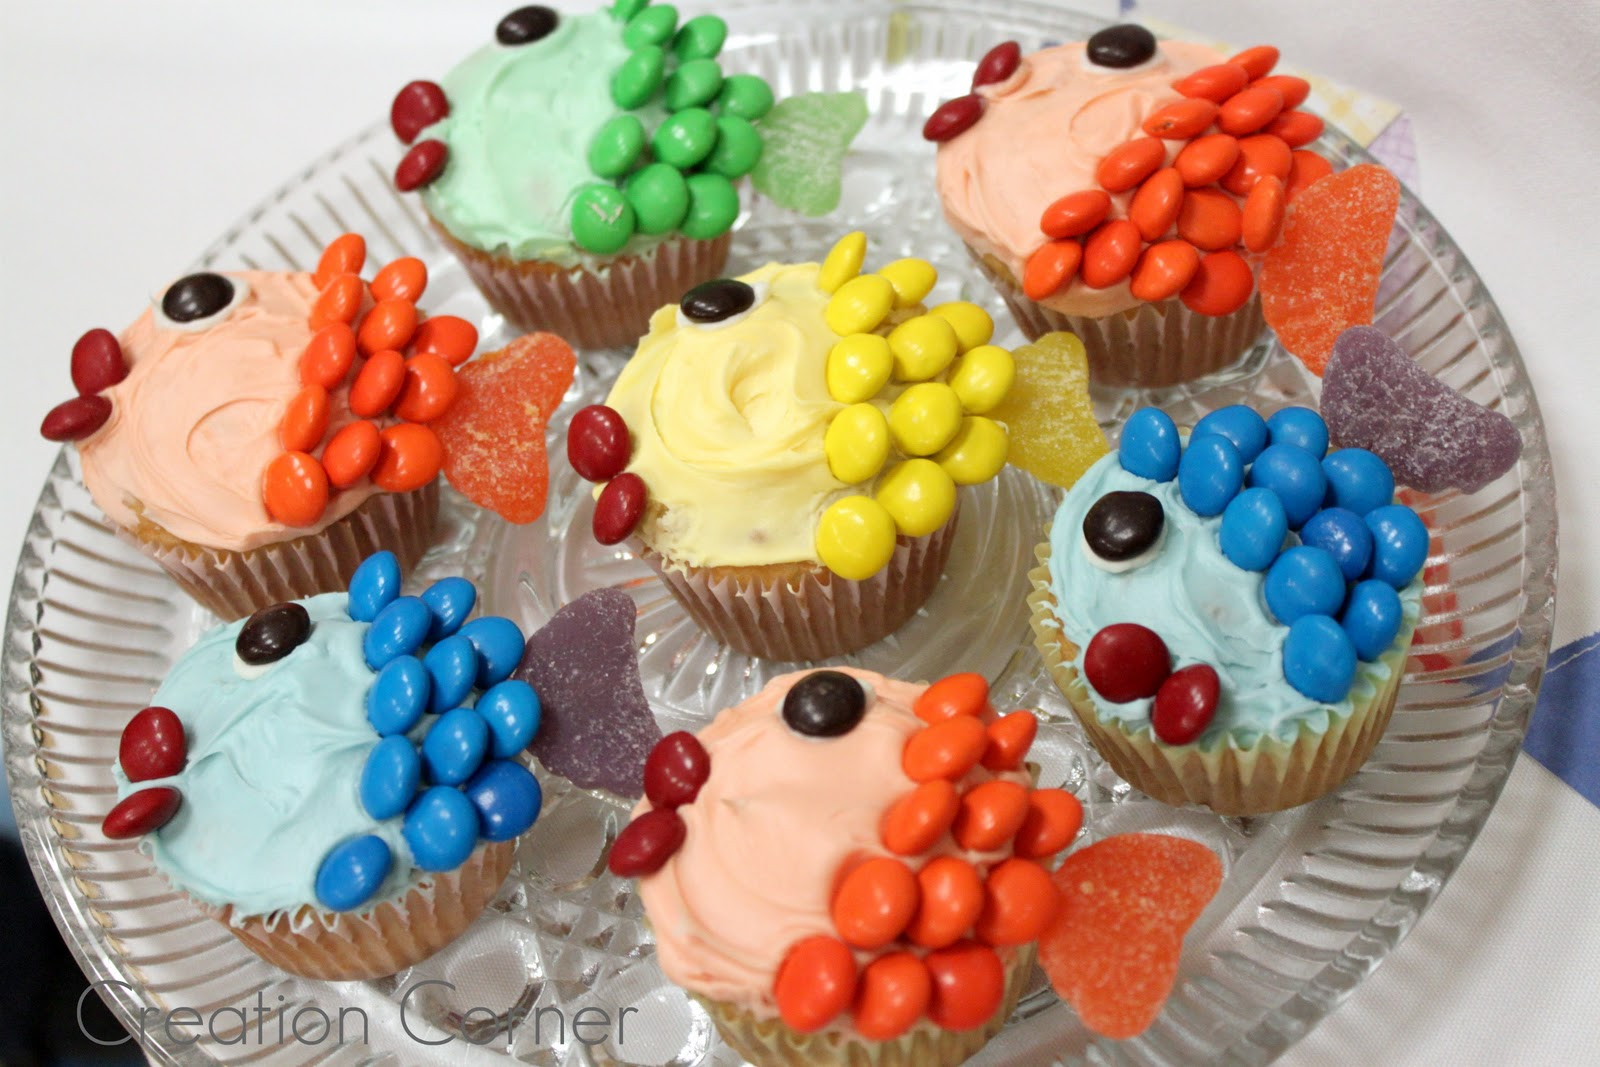 Cupcake Decorating Ideas For Church : Creation Corner: Fun Cupcake Ideas